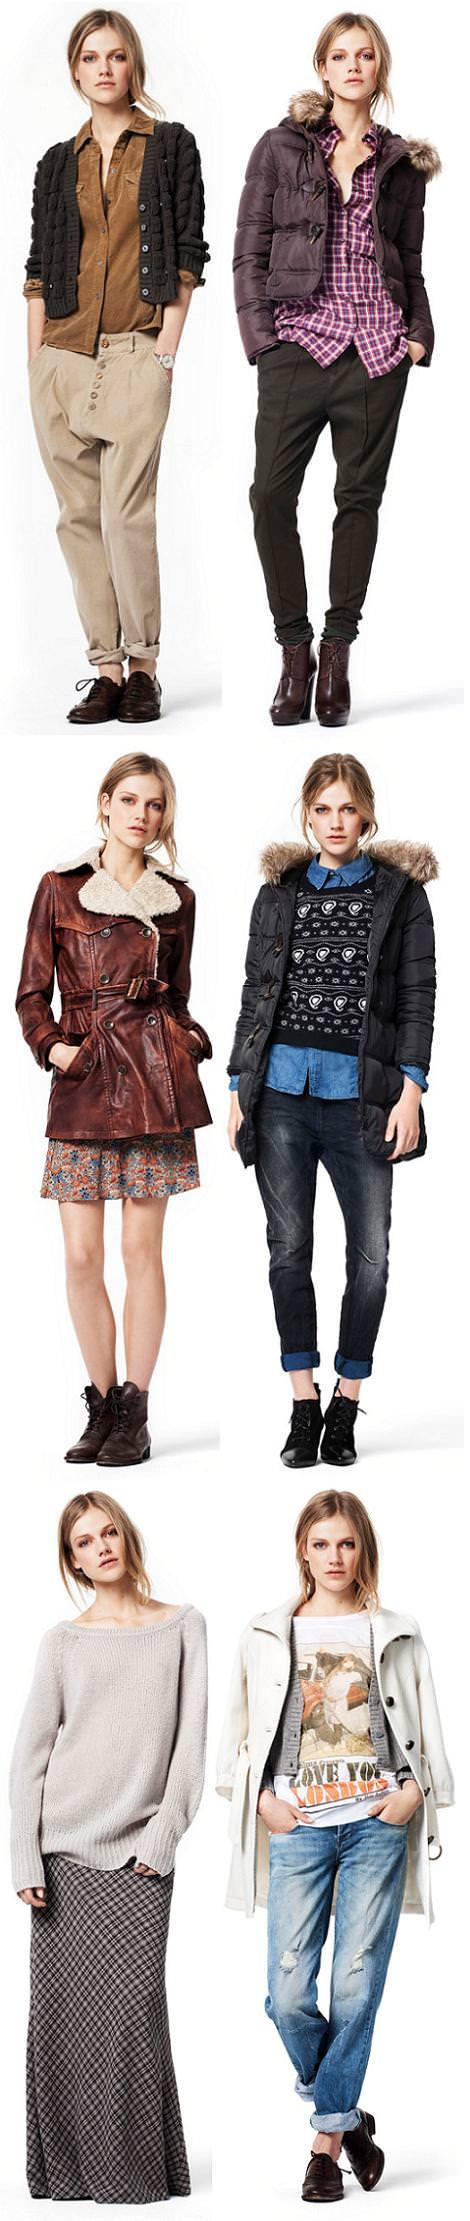 Zara TRF Lookbook: Noviembre 2010 (otoño invierno 2010 2011)